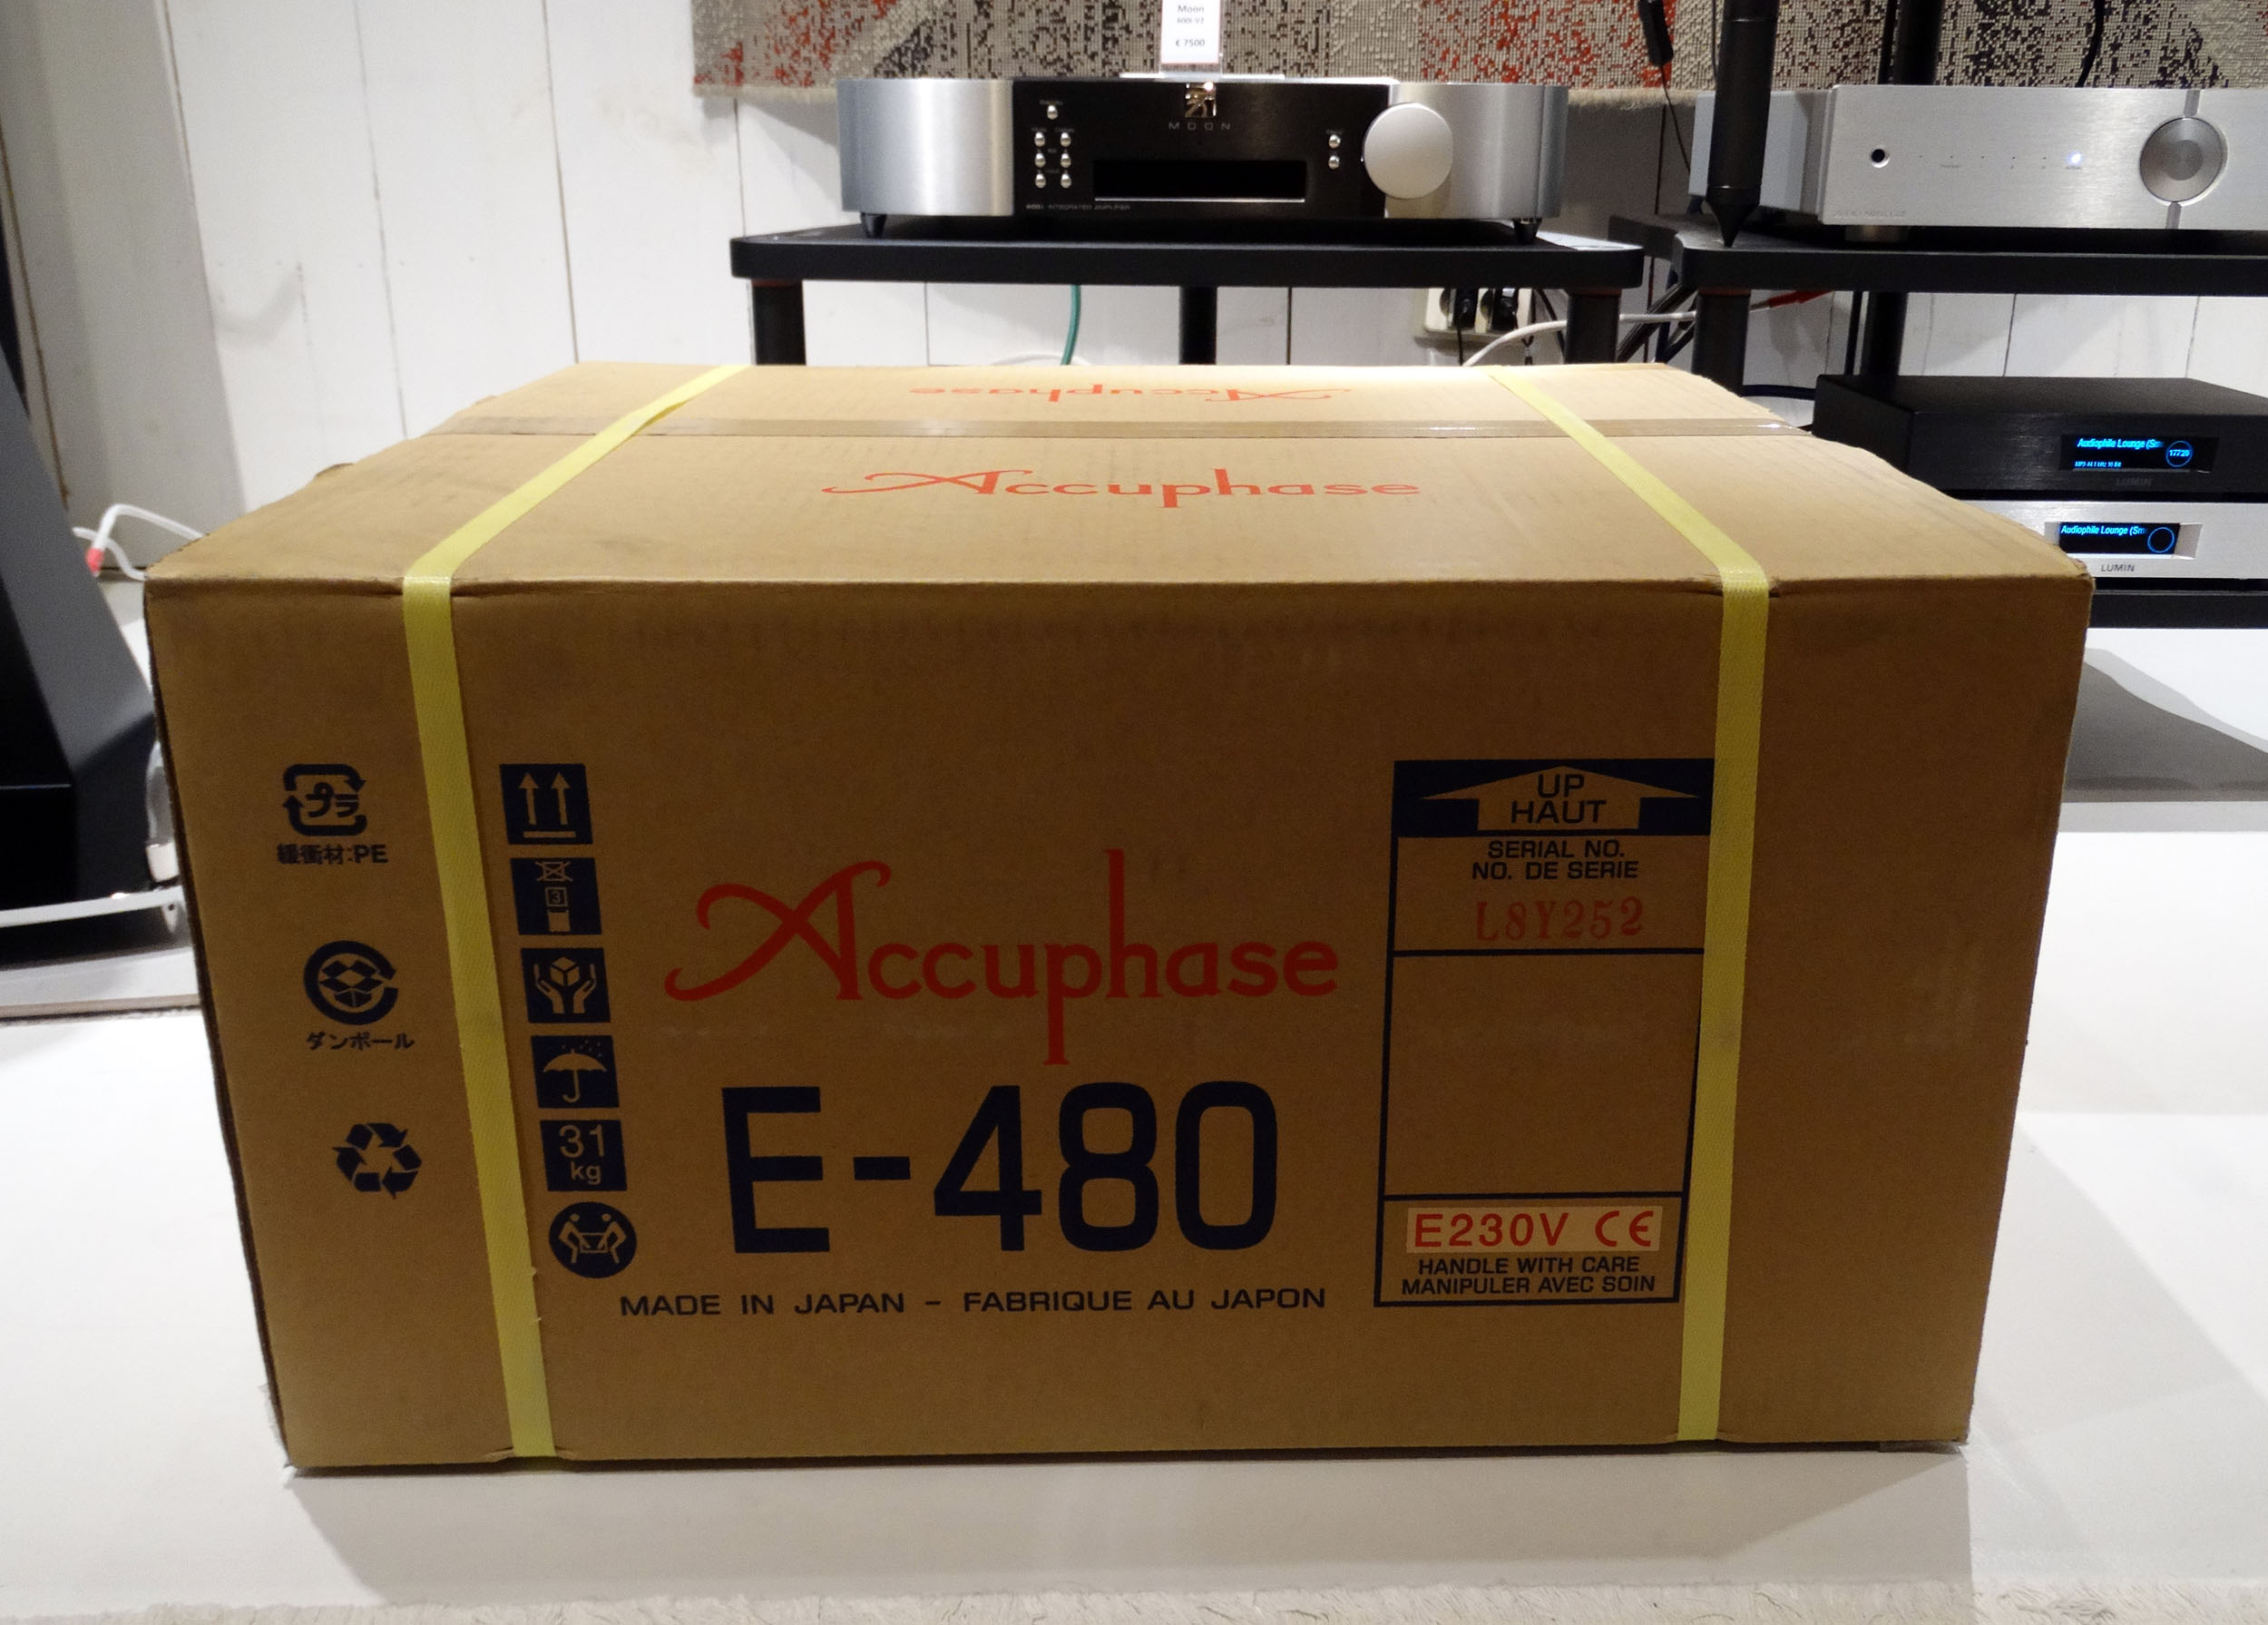 Accuphase E 480 Hans Audio 4 Nieuw binnen: Accuphase E-480